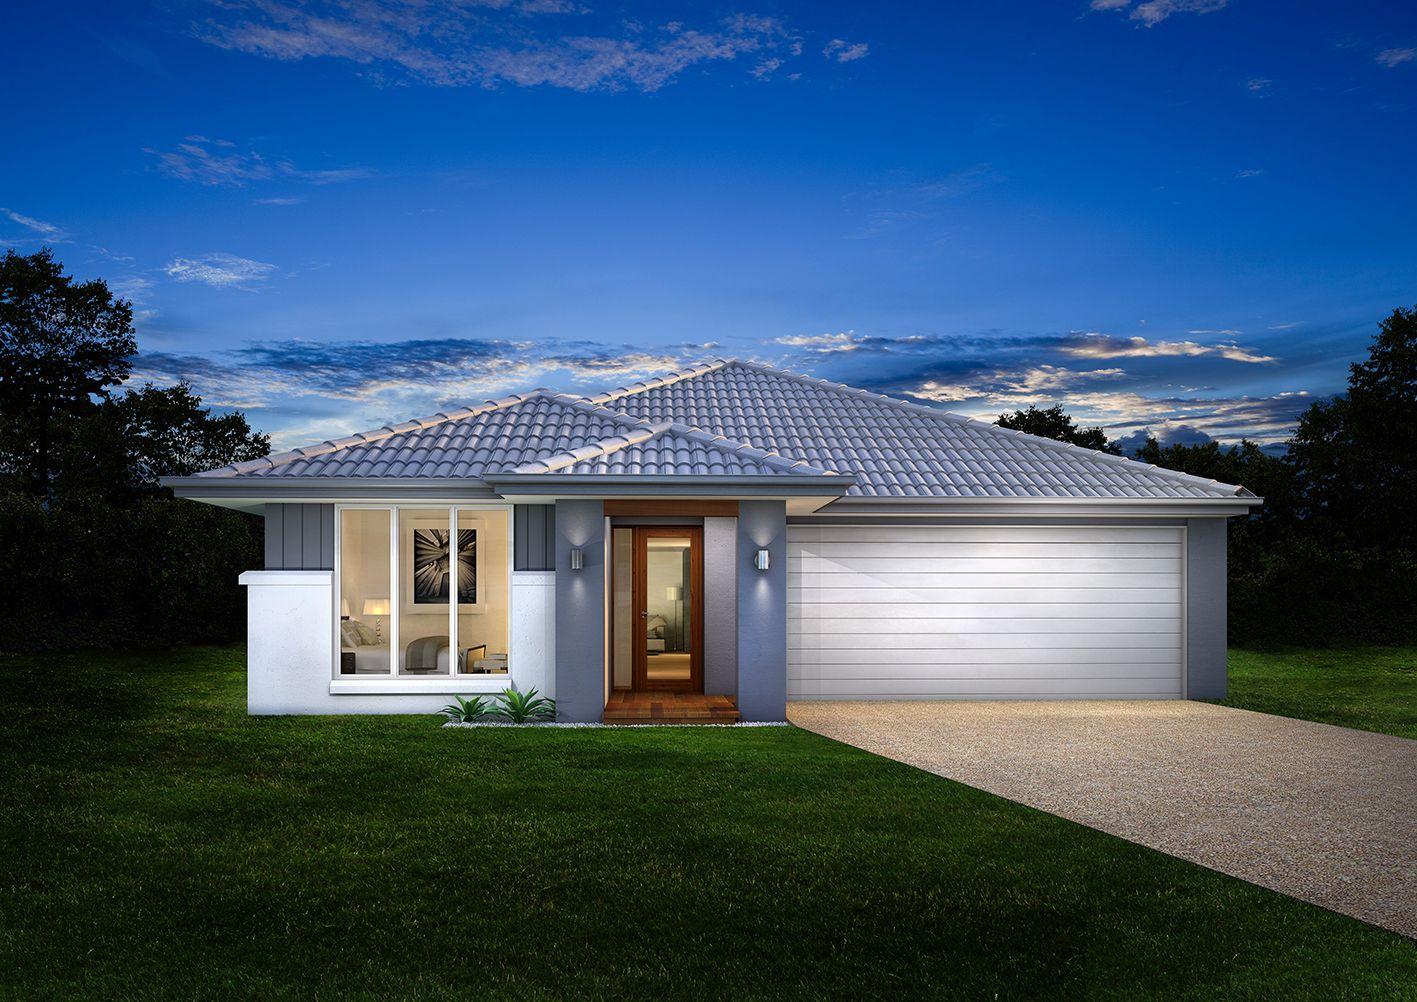 Lot 1003 Brindabella Street, Newport QLD 4020, Image 0